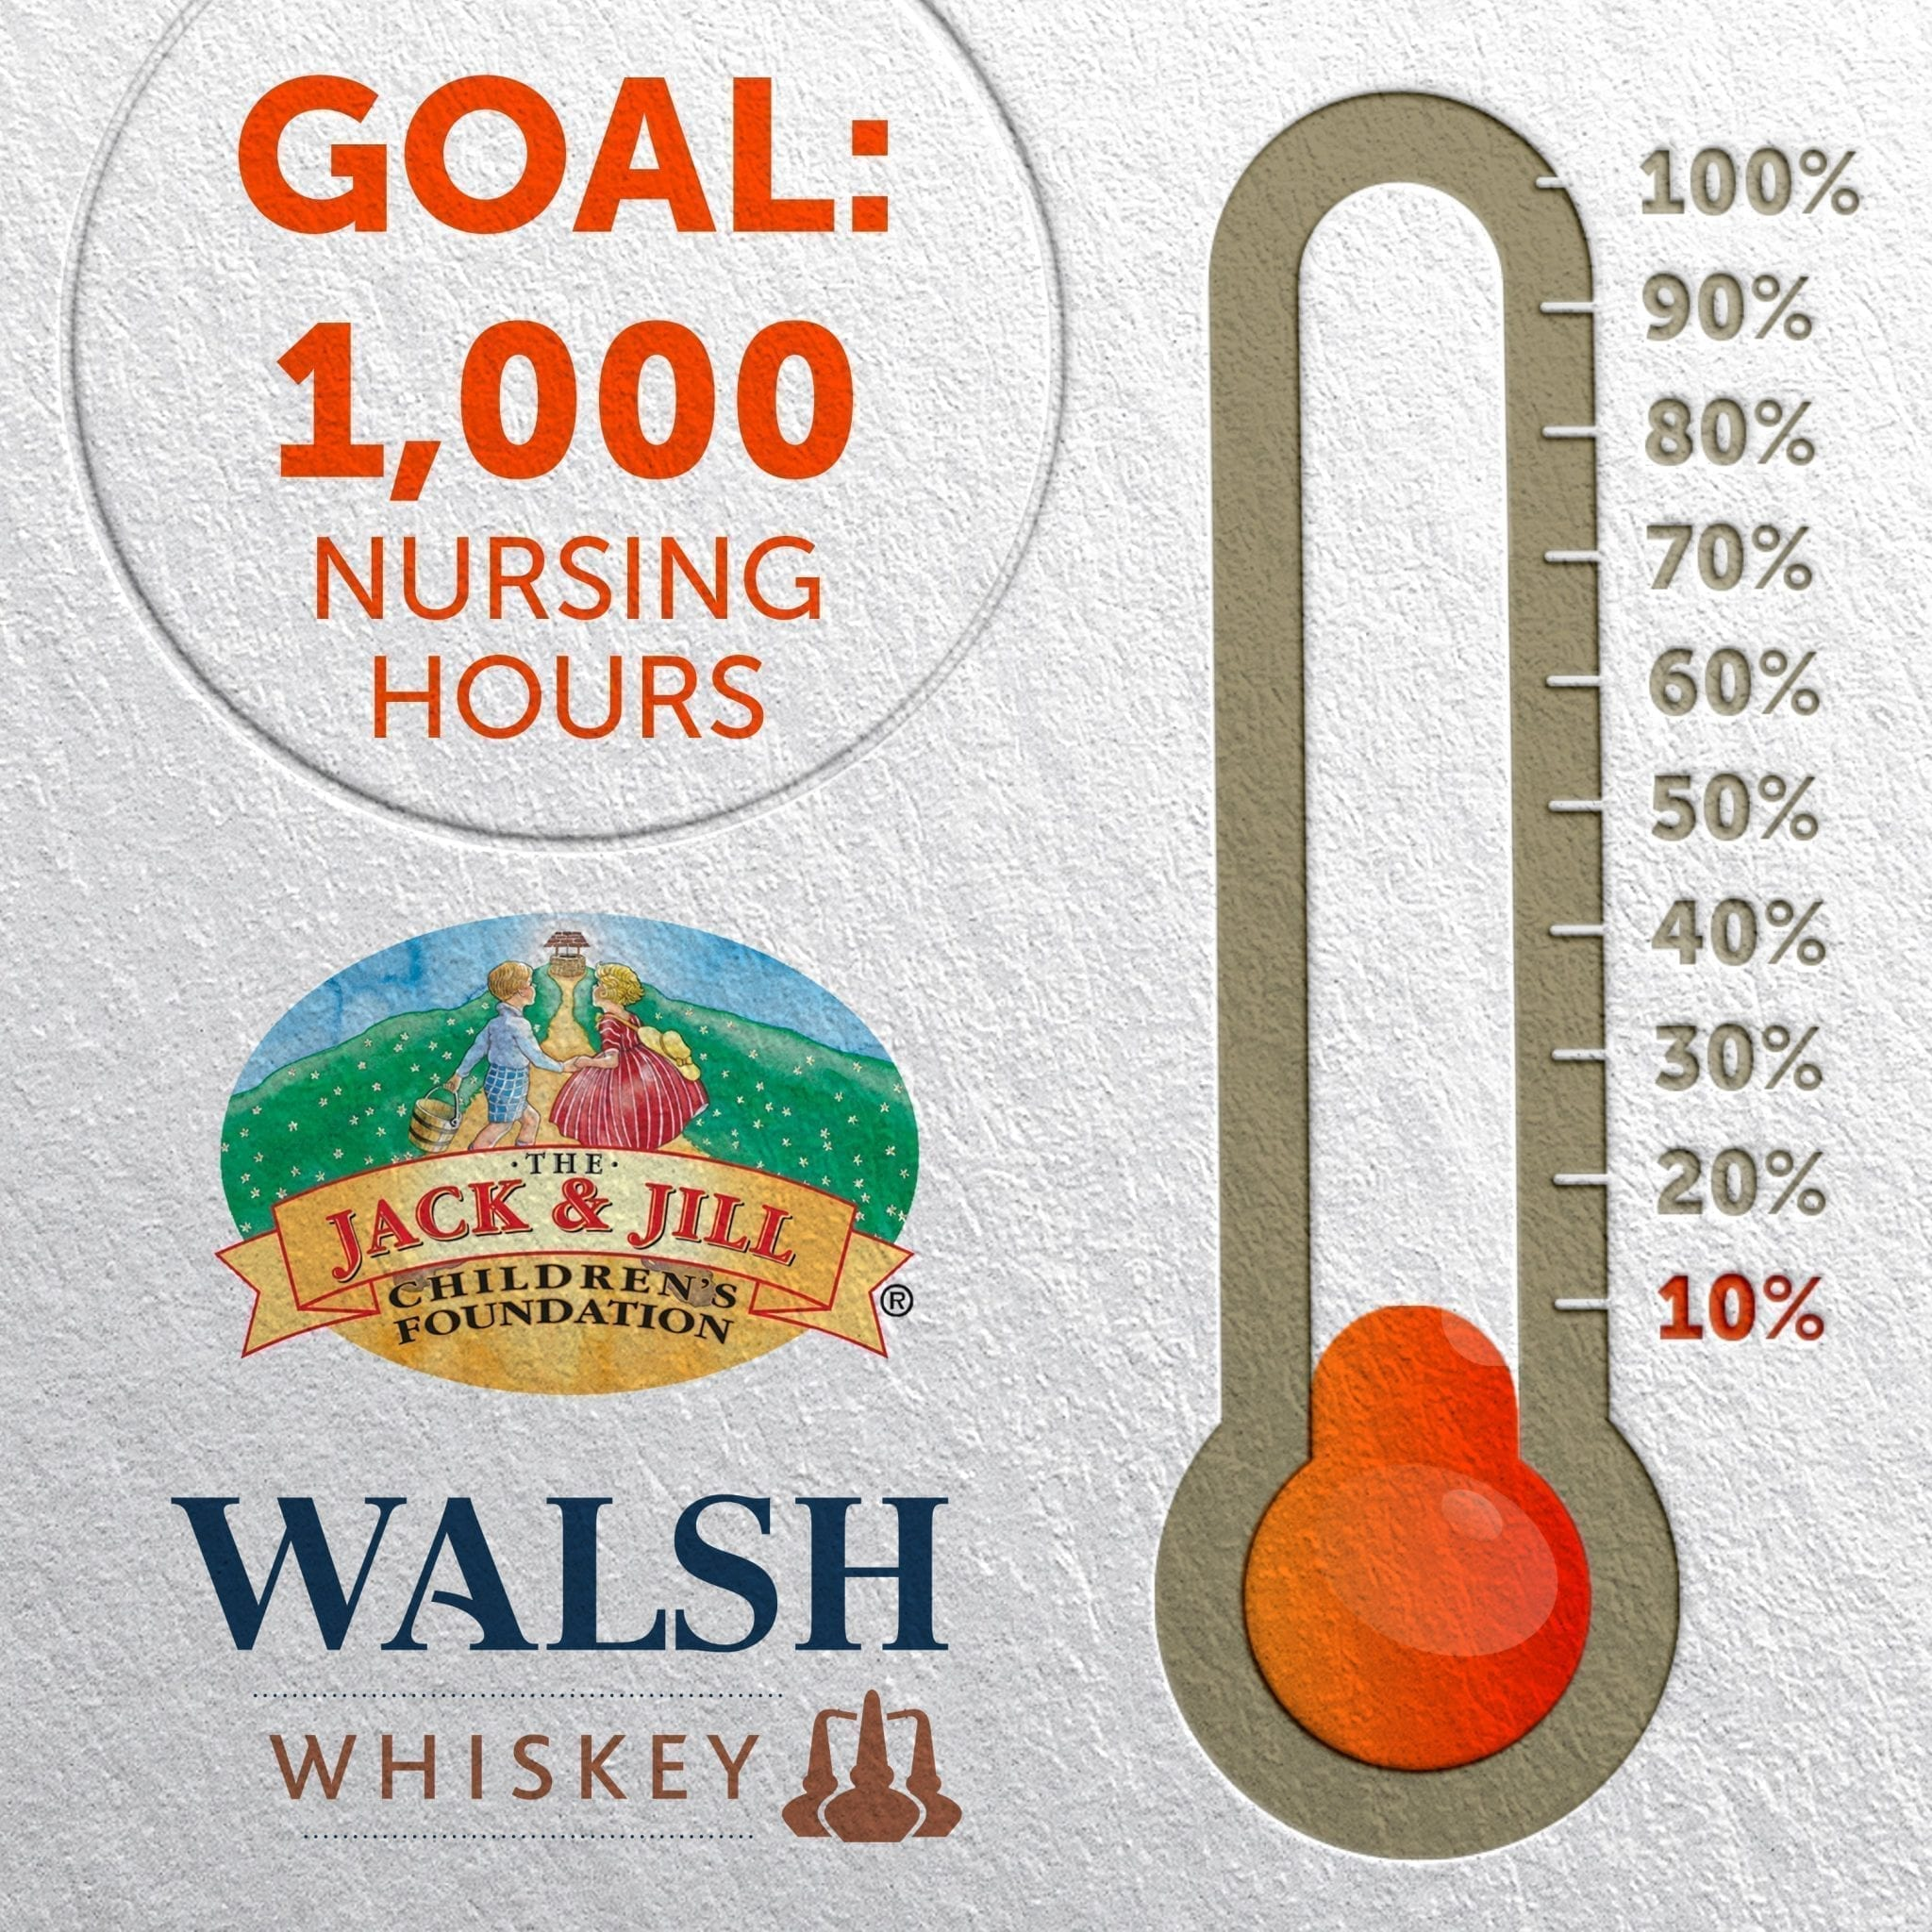 Walsh Whiskey Jack And Jill Logo Scaled